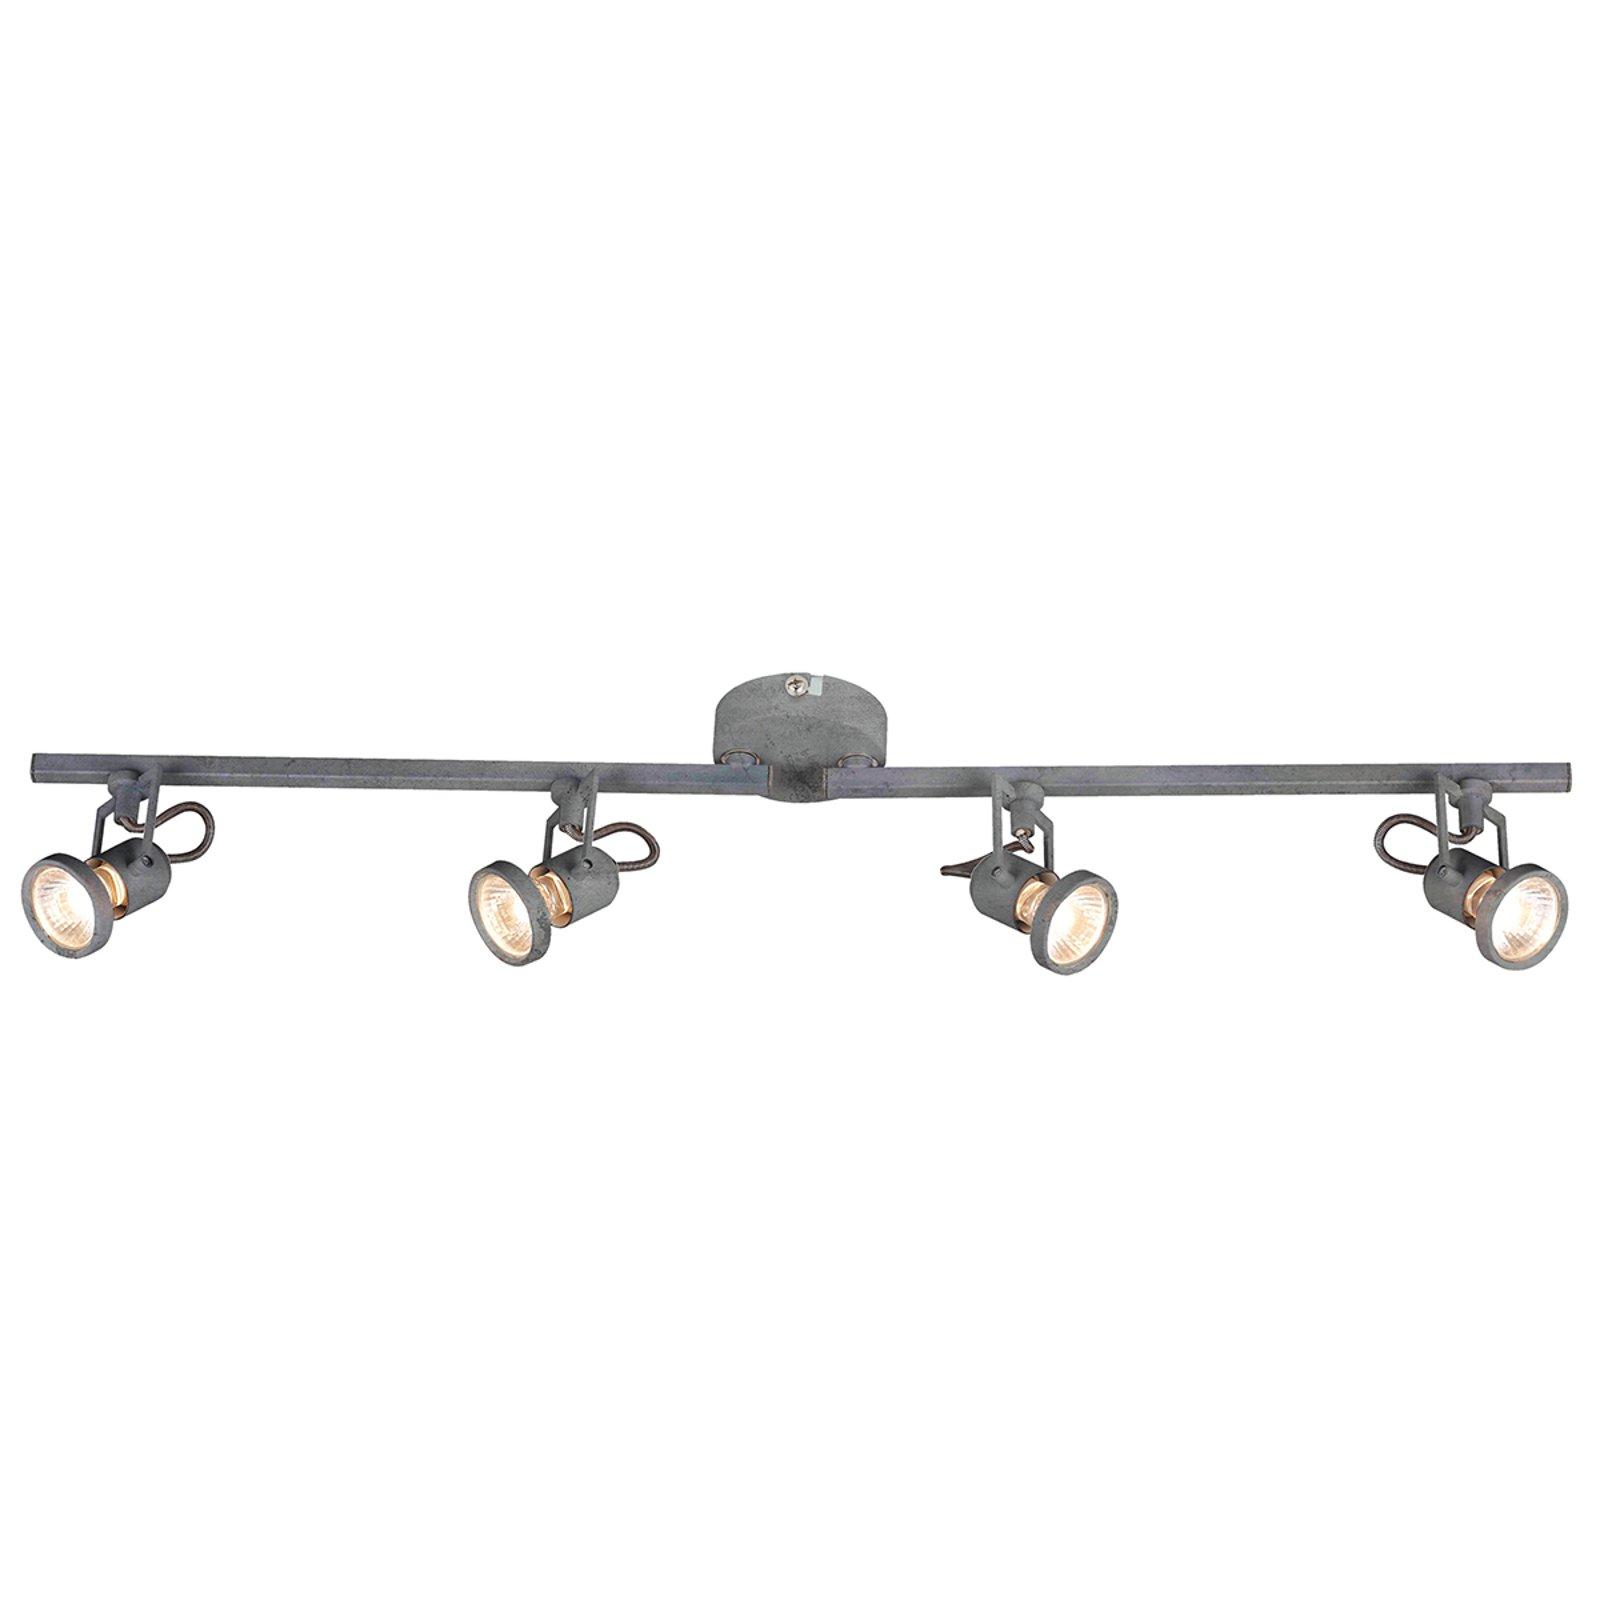 Justerbar LED-taklampe Concreto - 4 lys